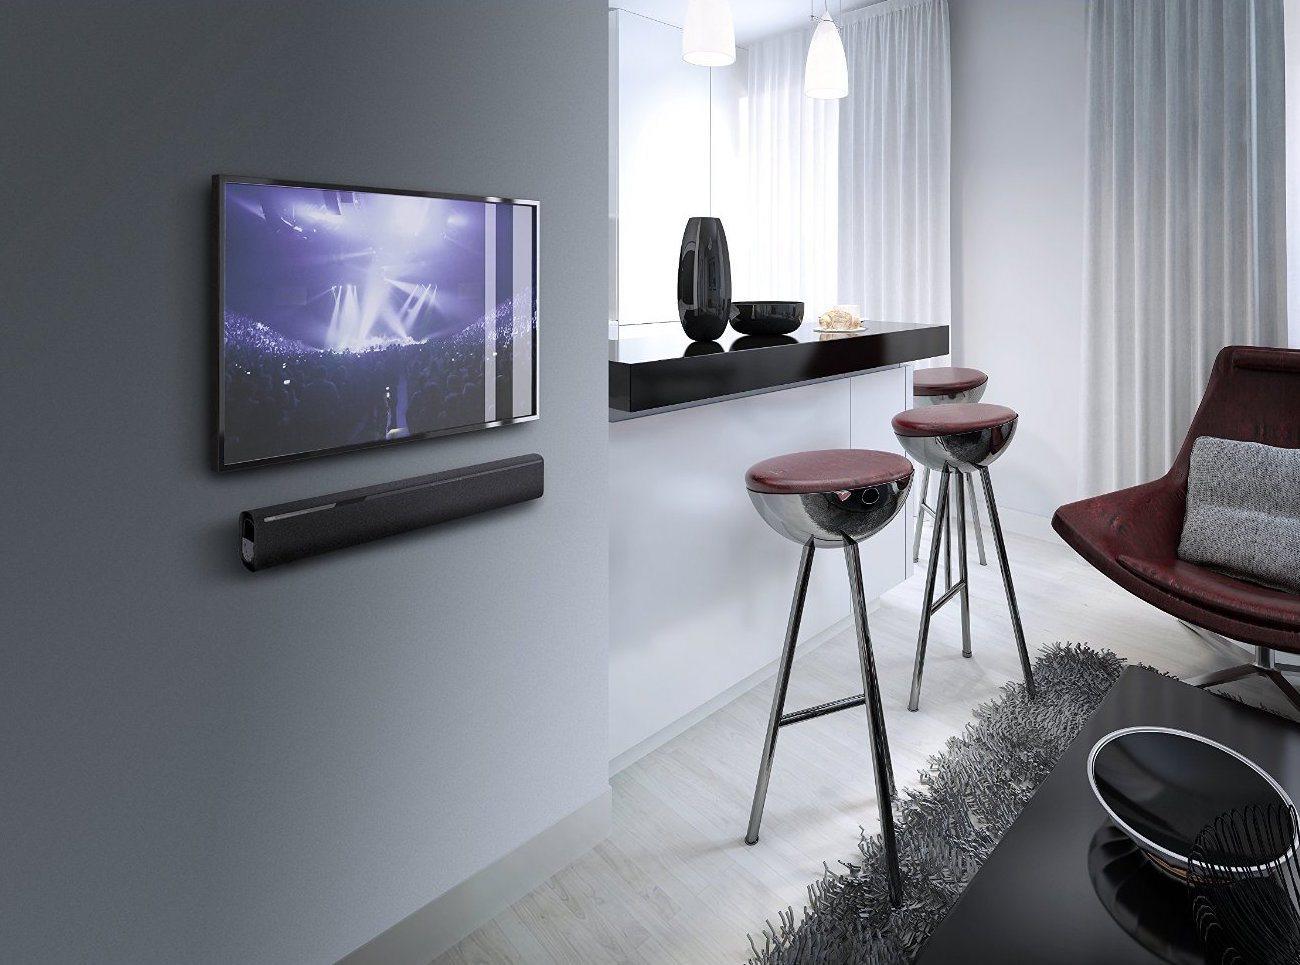 Connecting Yamaha Yas To Tv